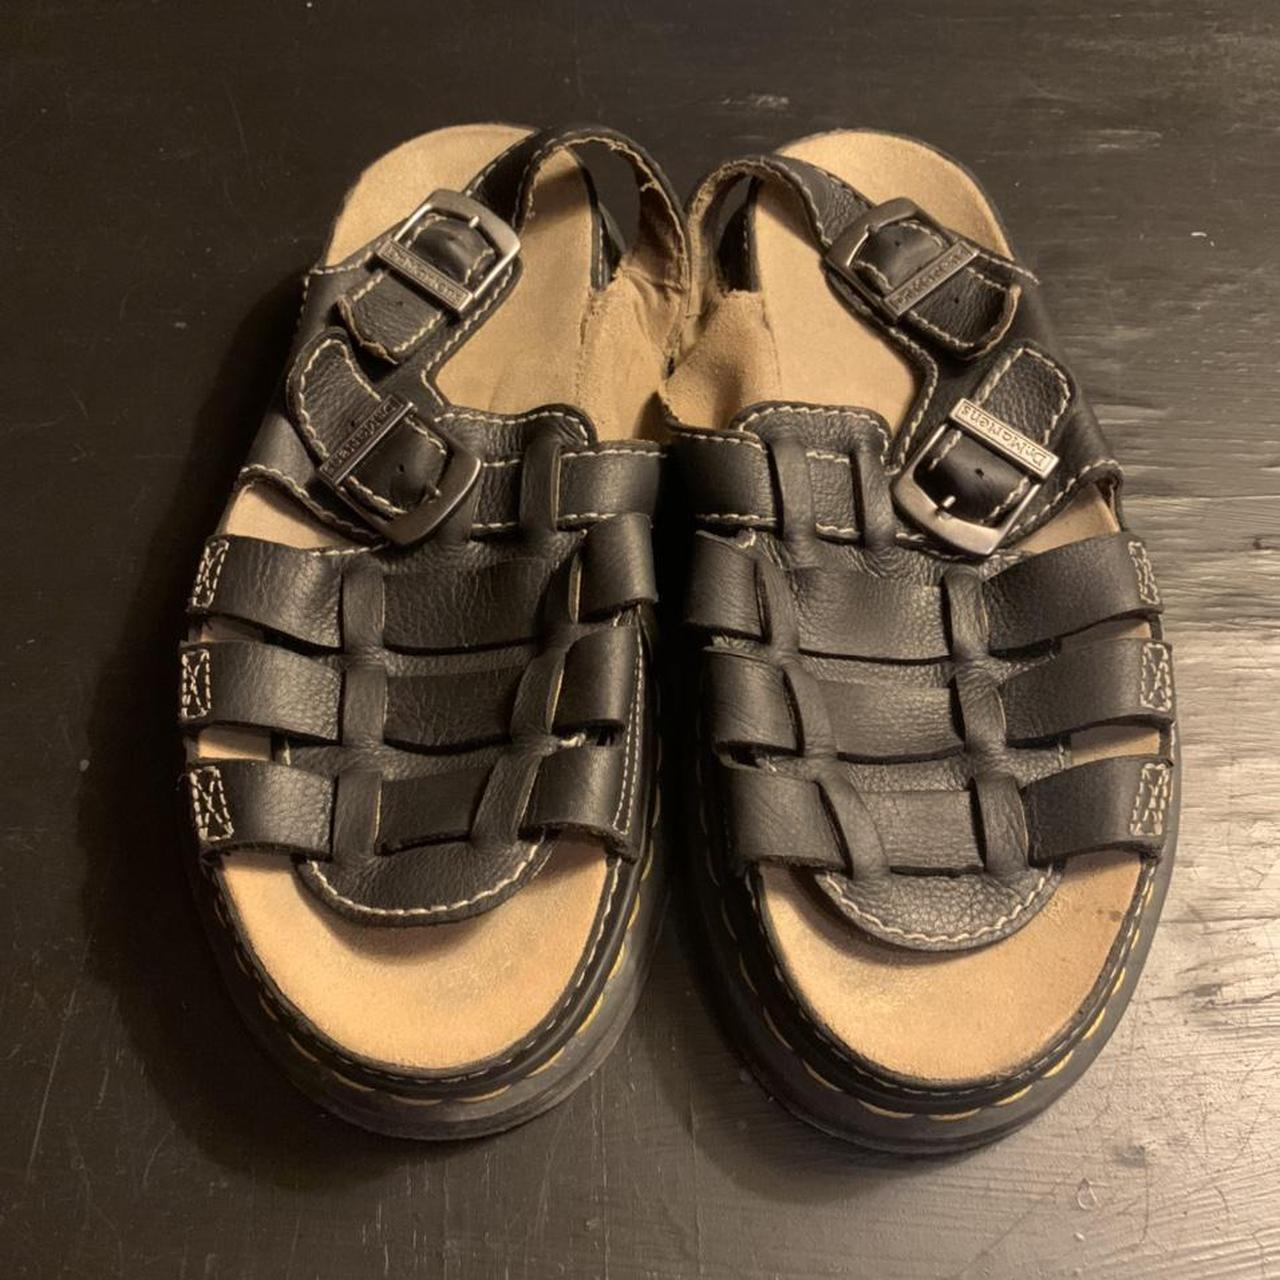 Product Image 1 - Doc Marten Leather Fisherman Sandals